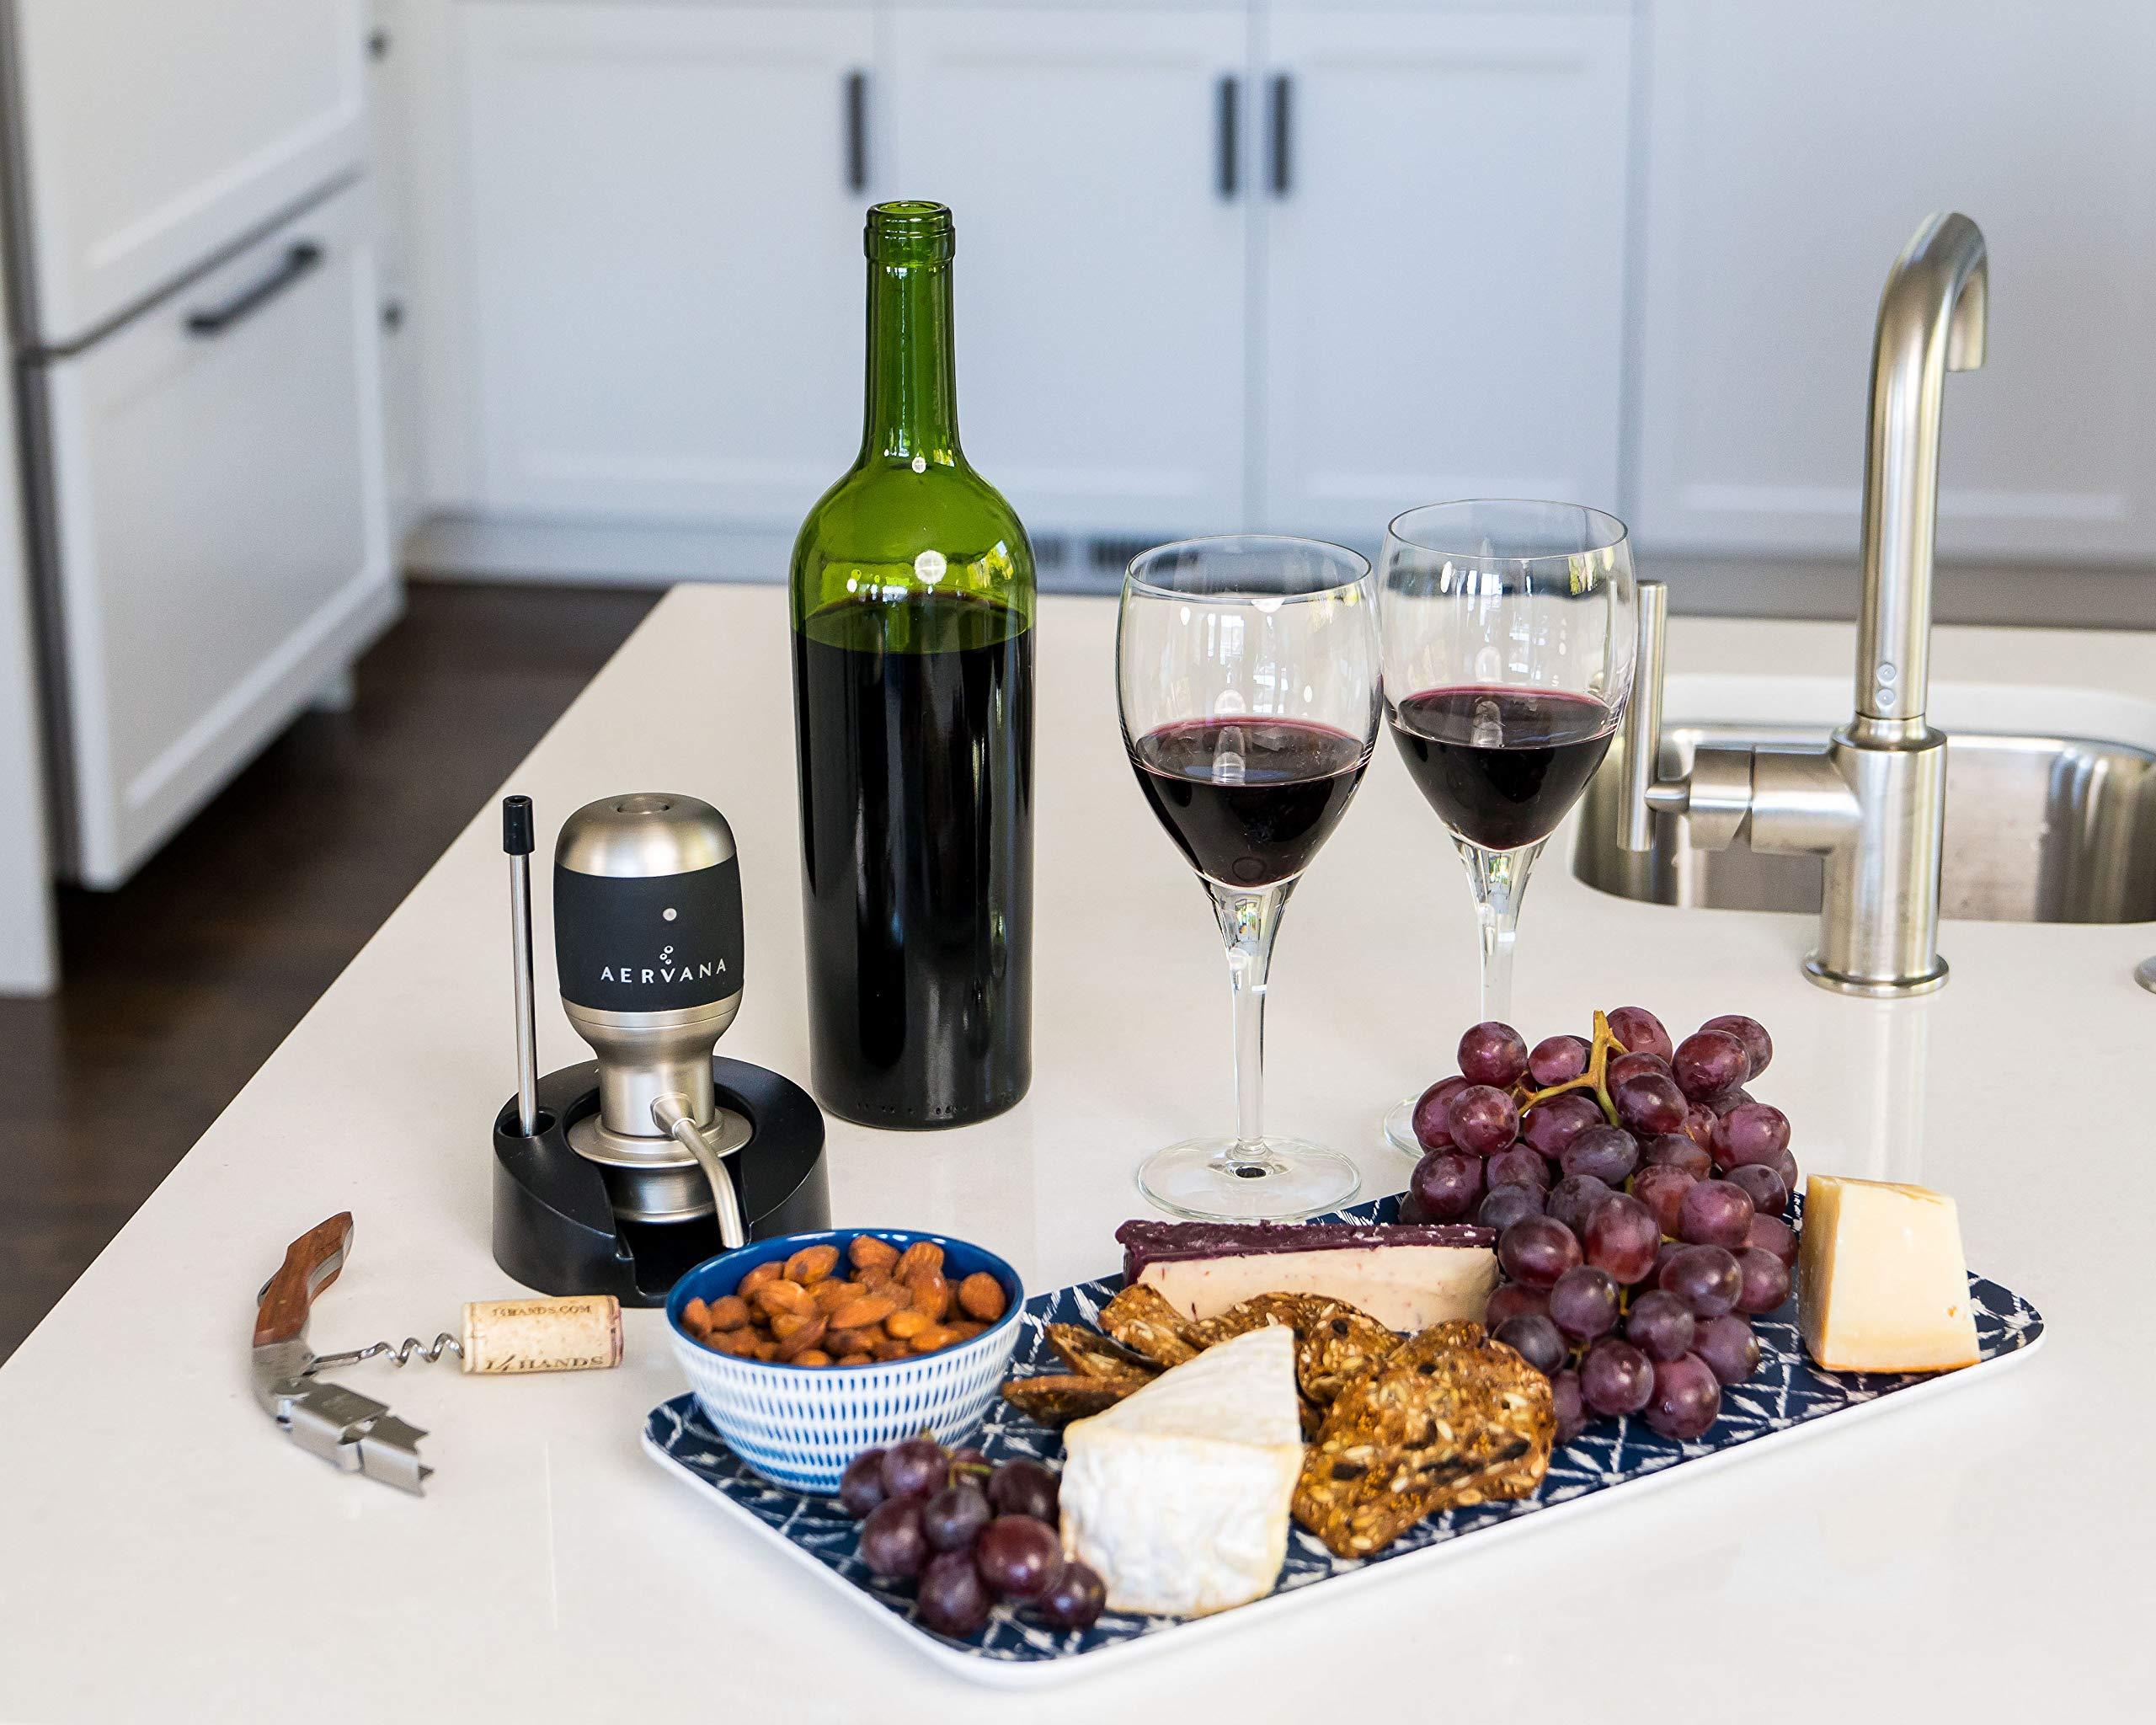 Aervana Original: 1 Touch Luxury Wine Aerator with Display Stand